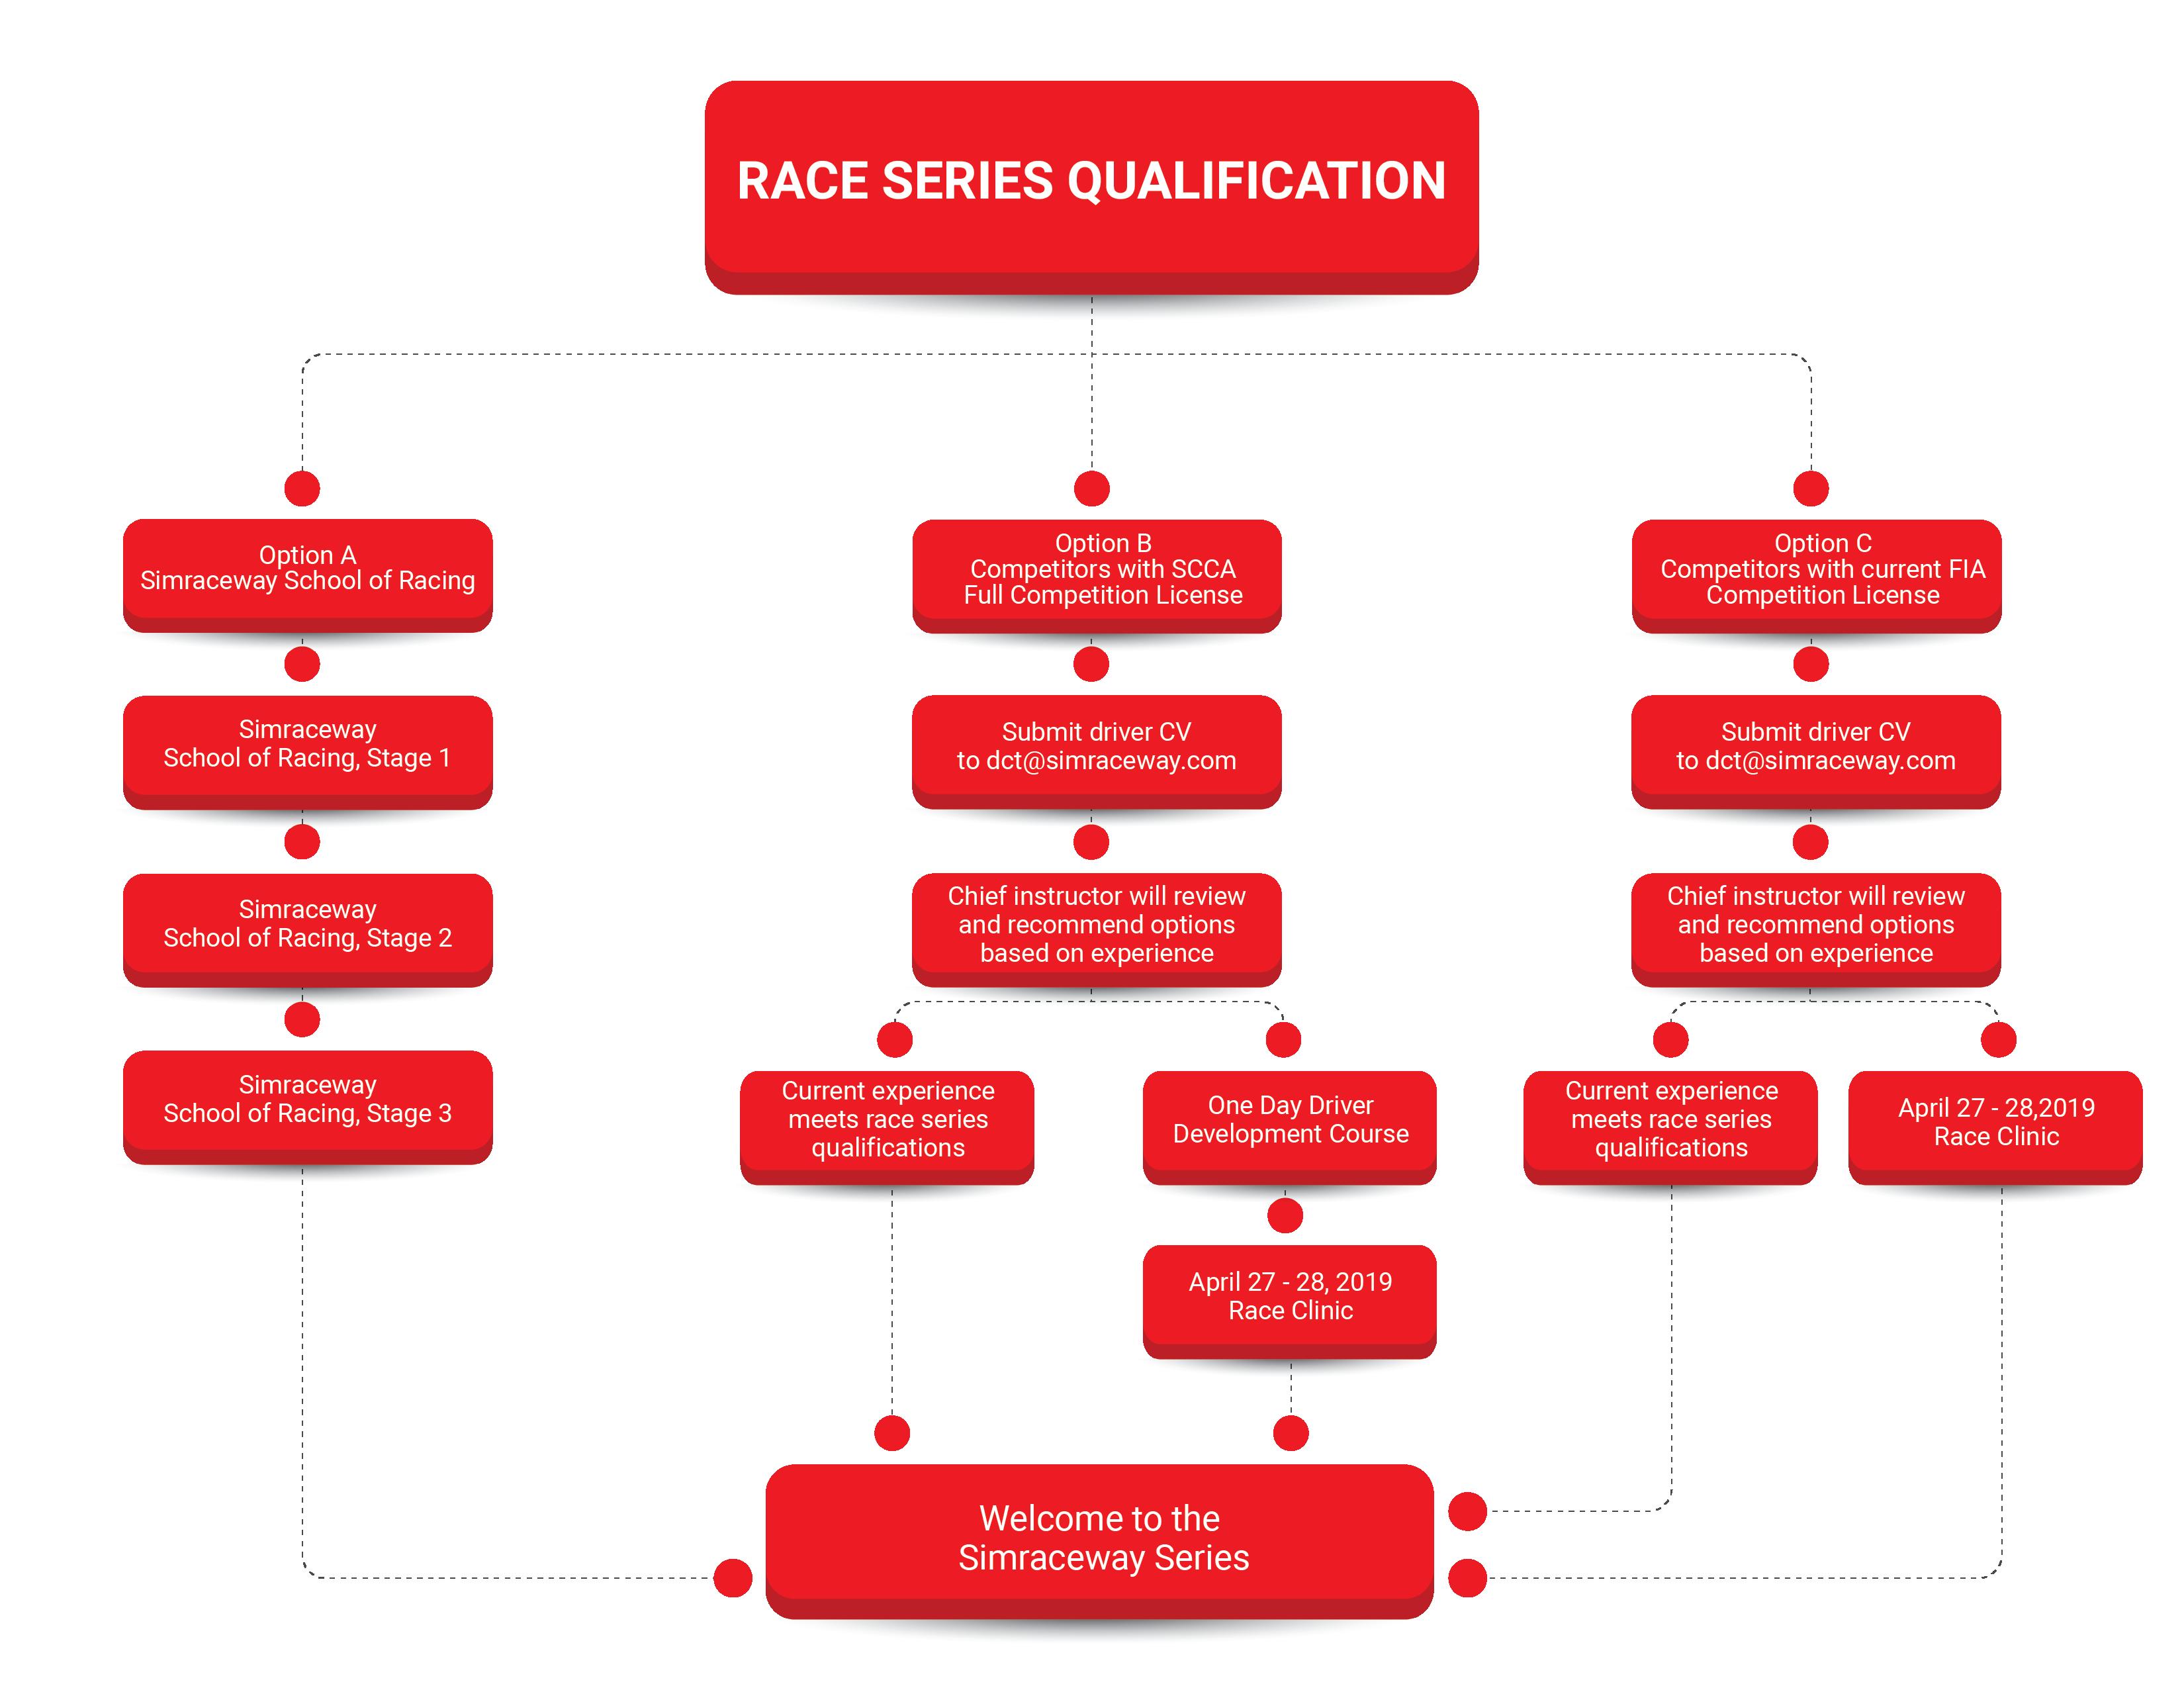 398198_Race Series Qualification - Flow Chart_032919